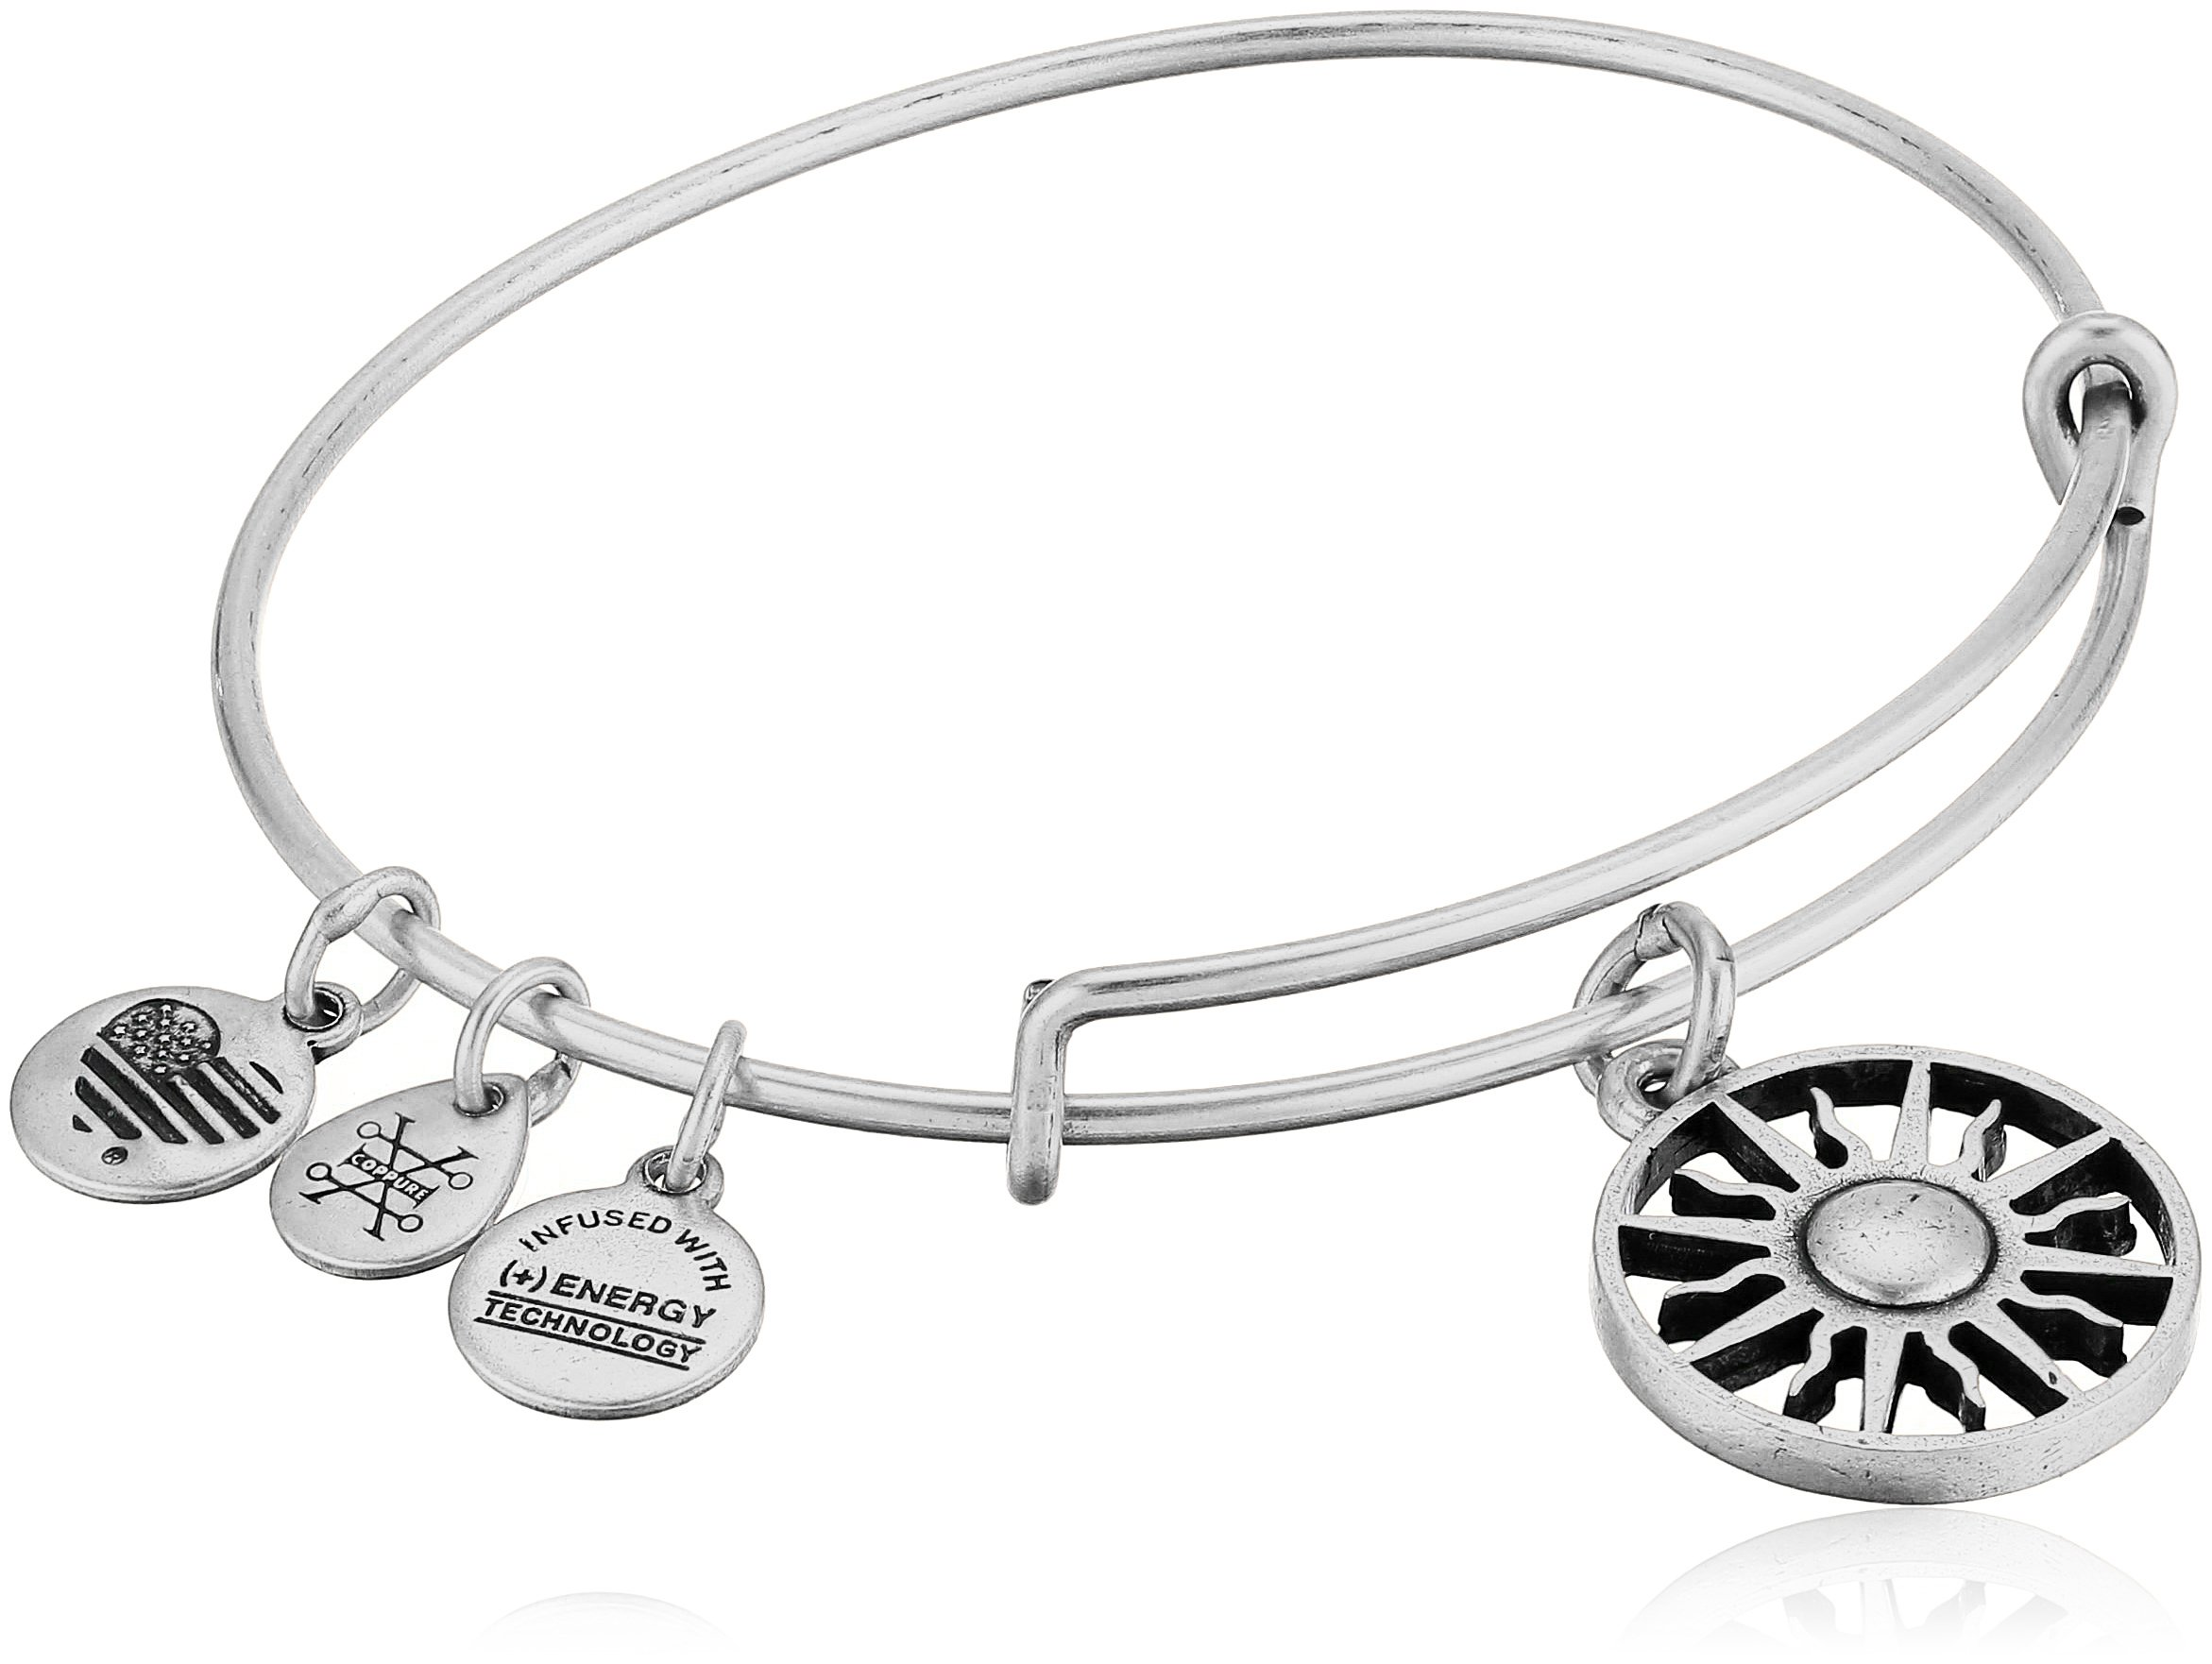 Alex and Ani Women's Rising Sun Charm Bangle Bracelet, Rafaelian Silver, Expandable